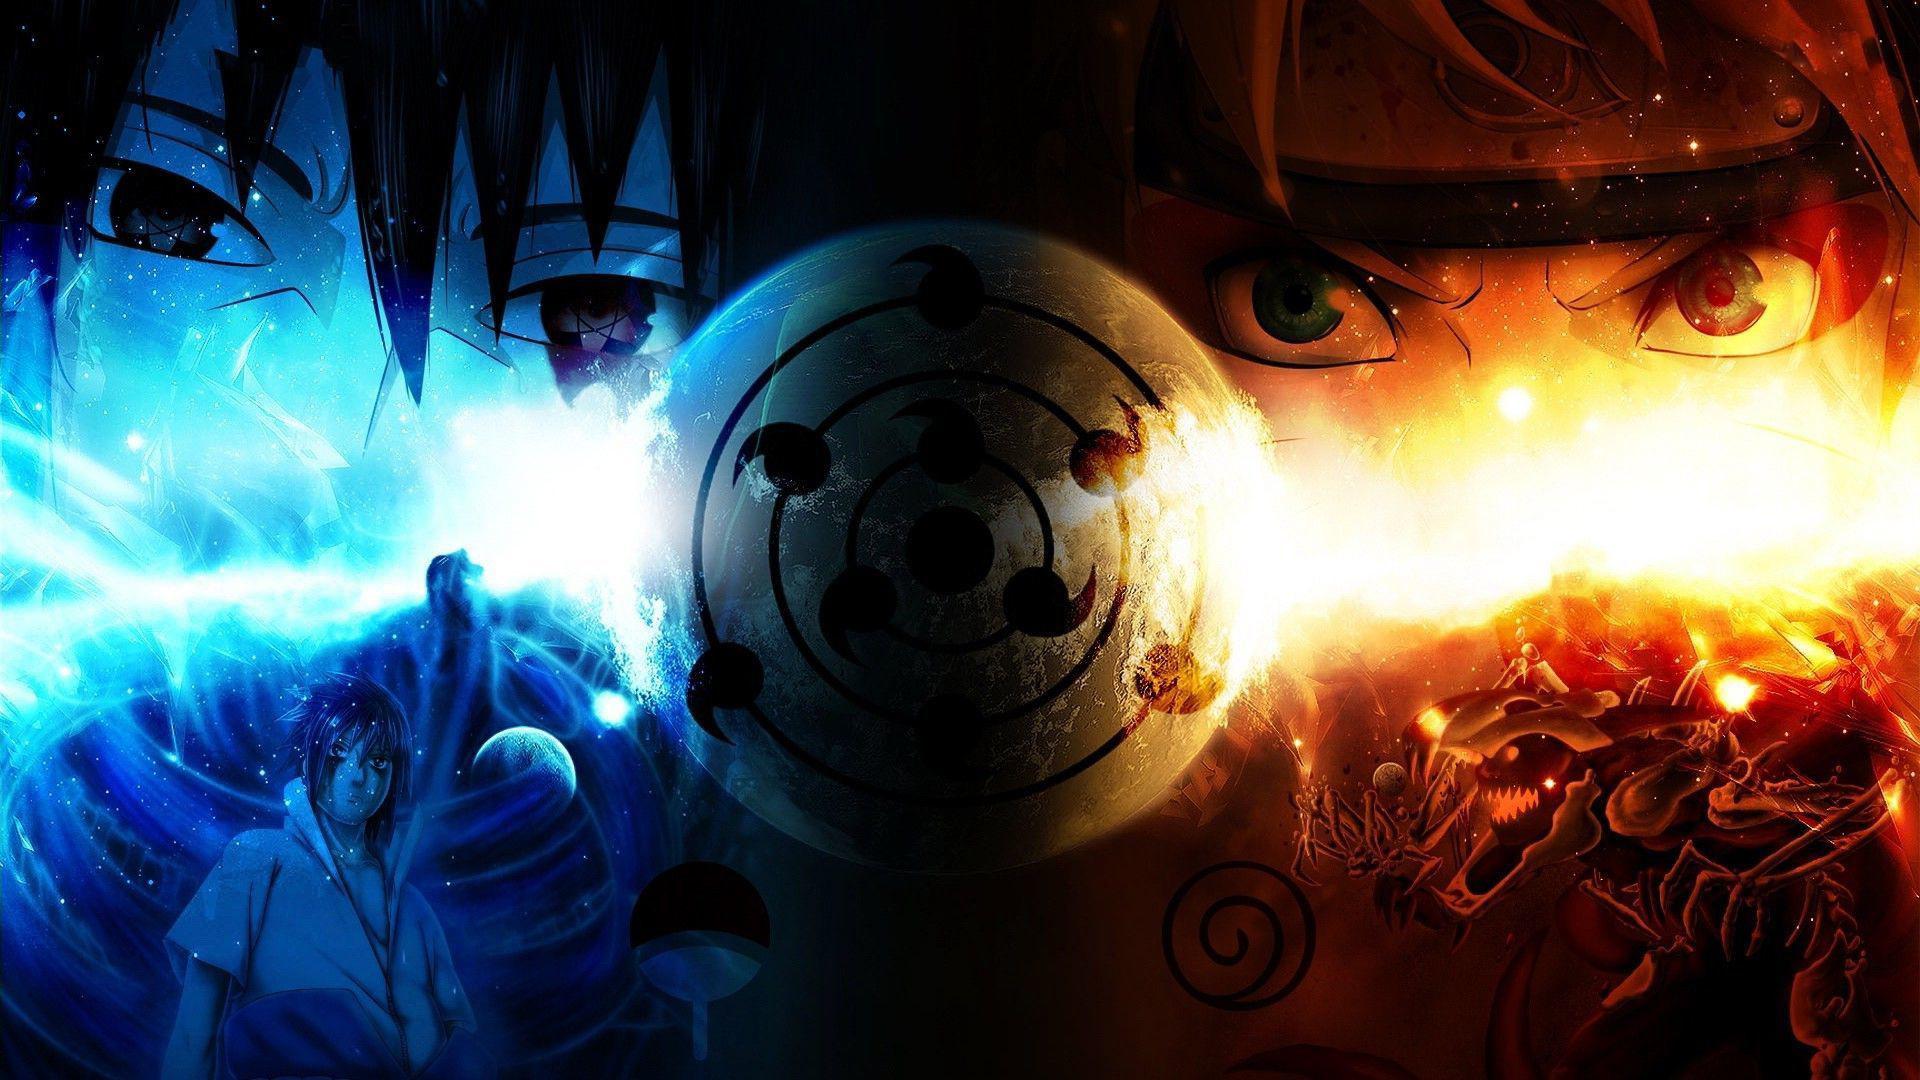 65 4K Naruto Wallpapers on WallpaperPlay